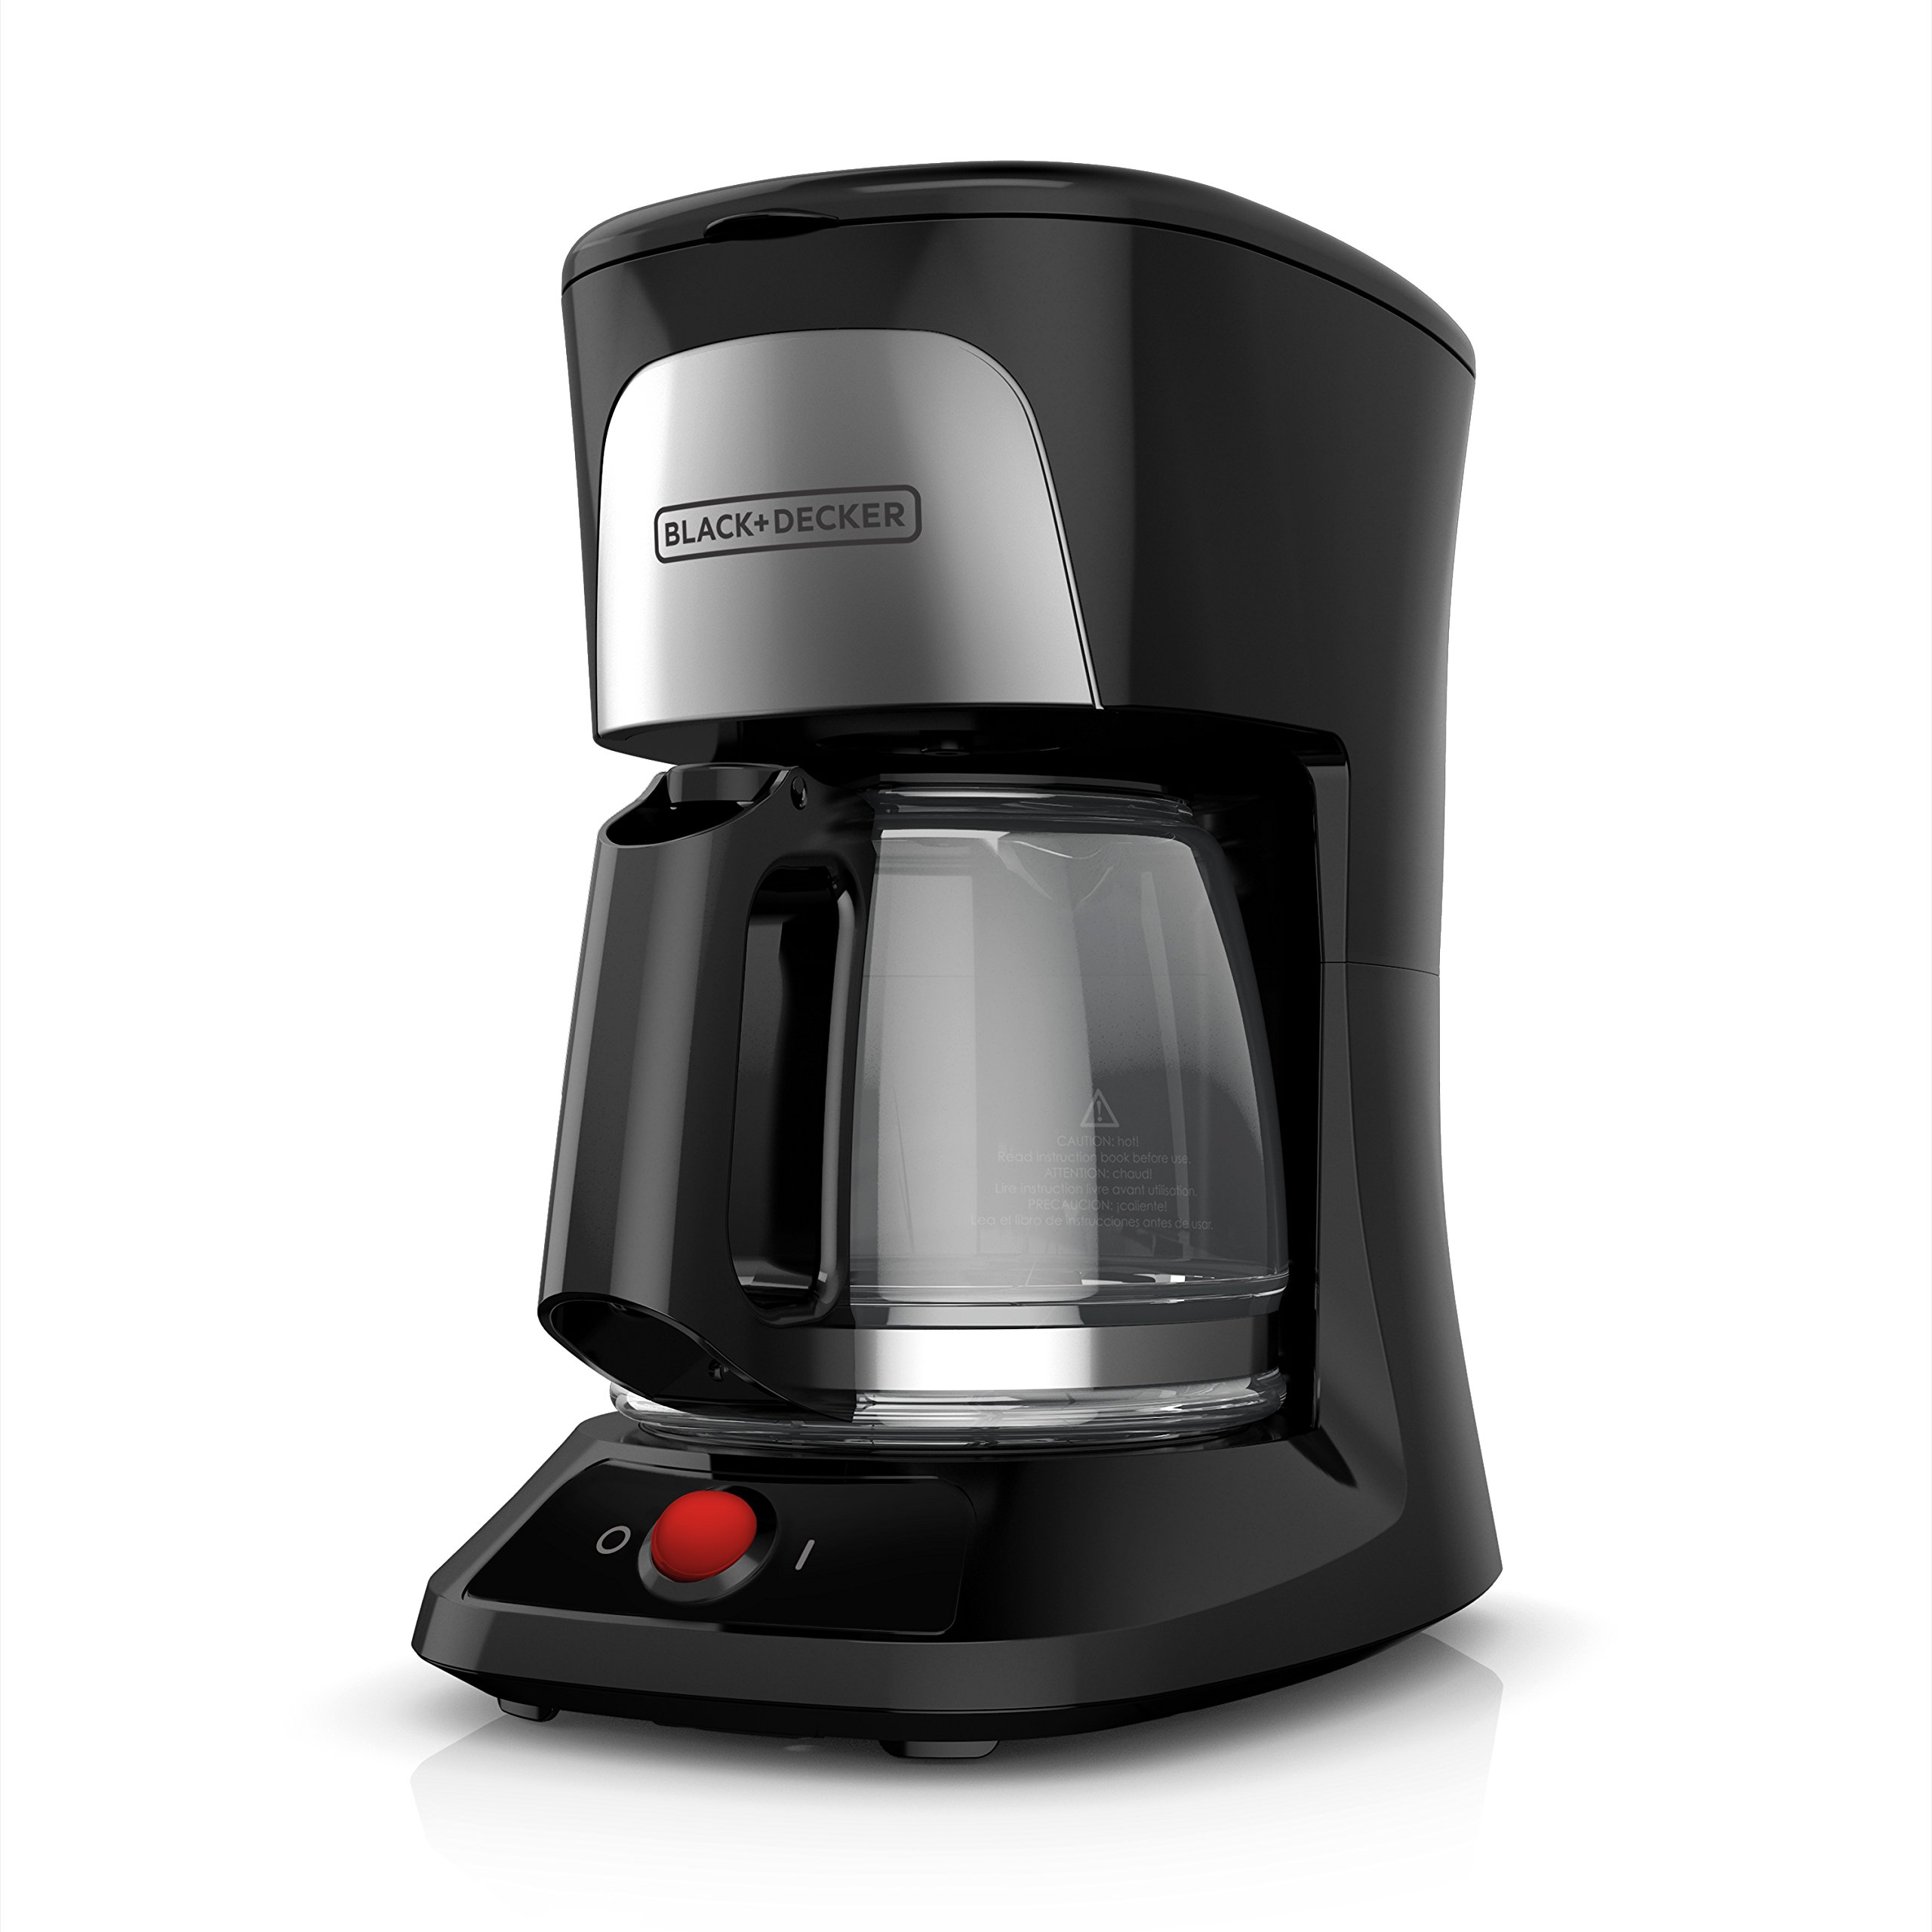 BLACK+DECKER 5-Cup Coffeemaker with Duralife Glass Carafe, Black, CM0555B by BLACK+DECKER